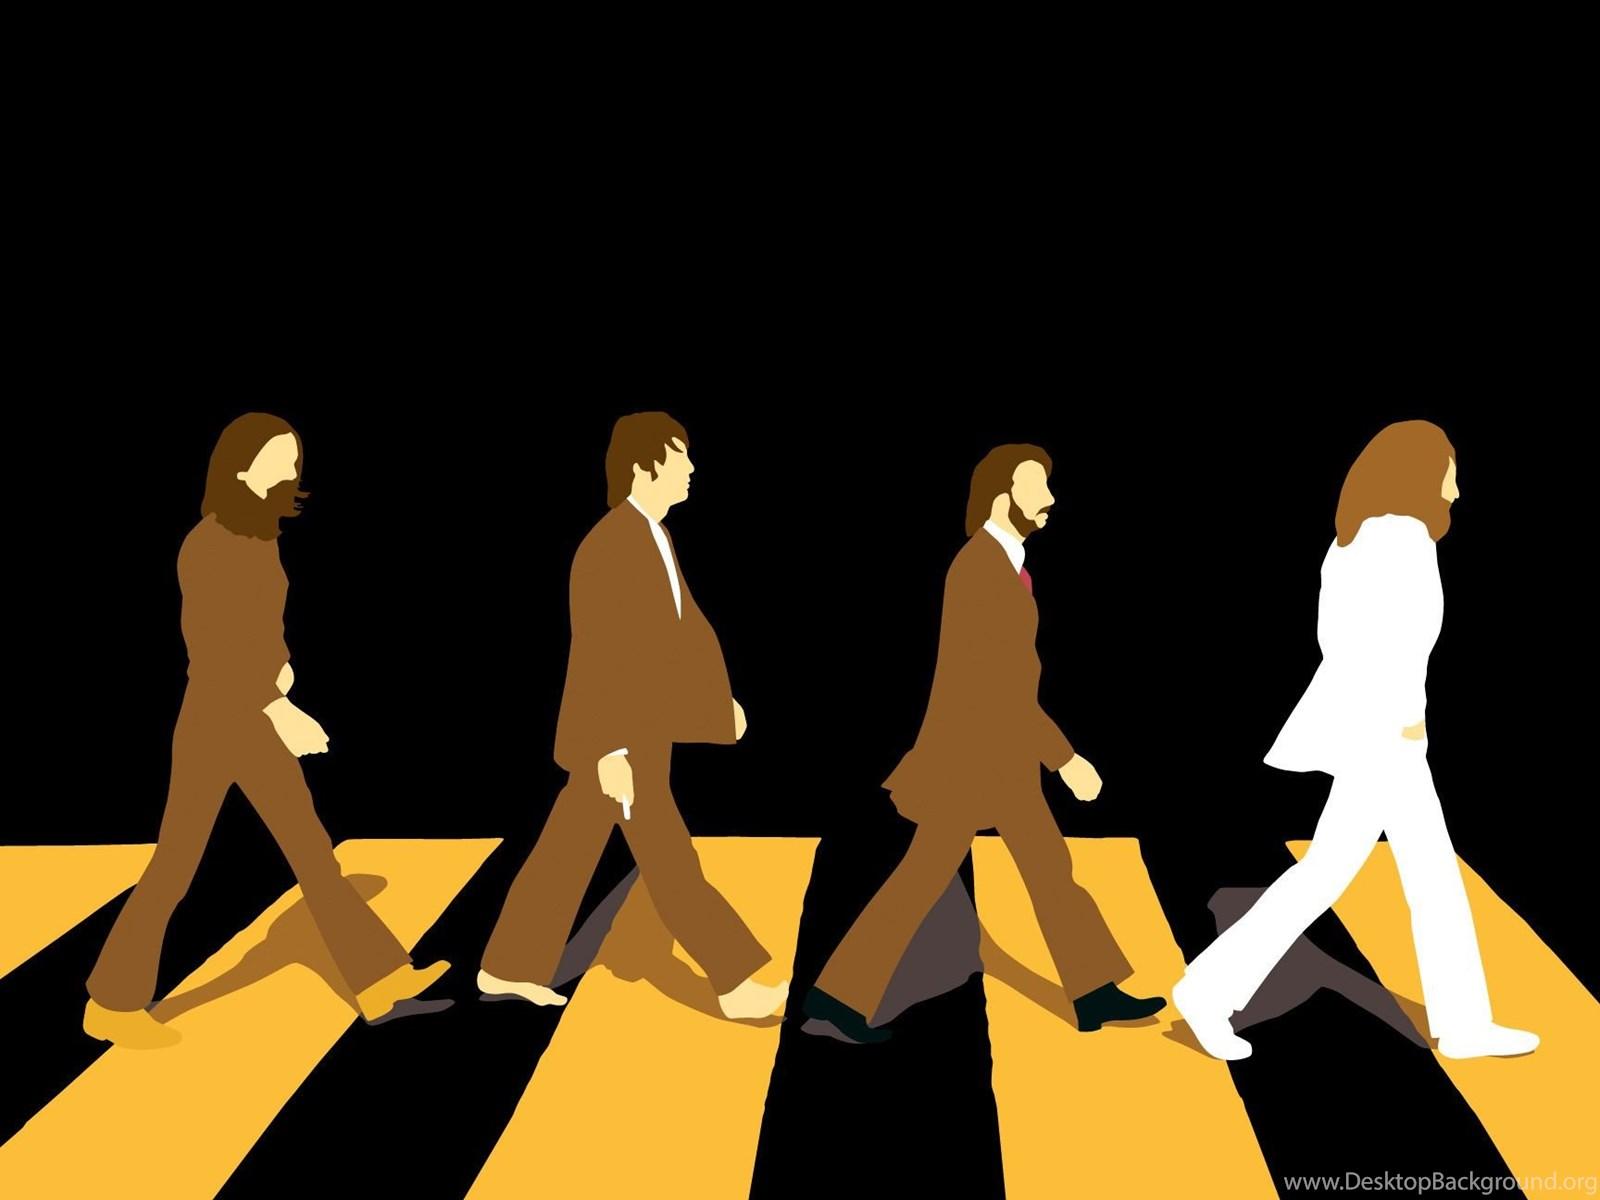 The beatles desktop backgrounds b12 rock band wallpapers - Beatles iphone wallpaper ...